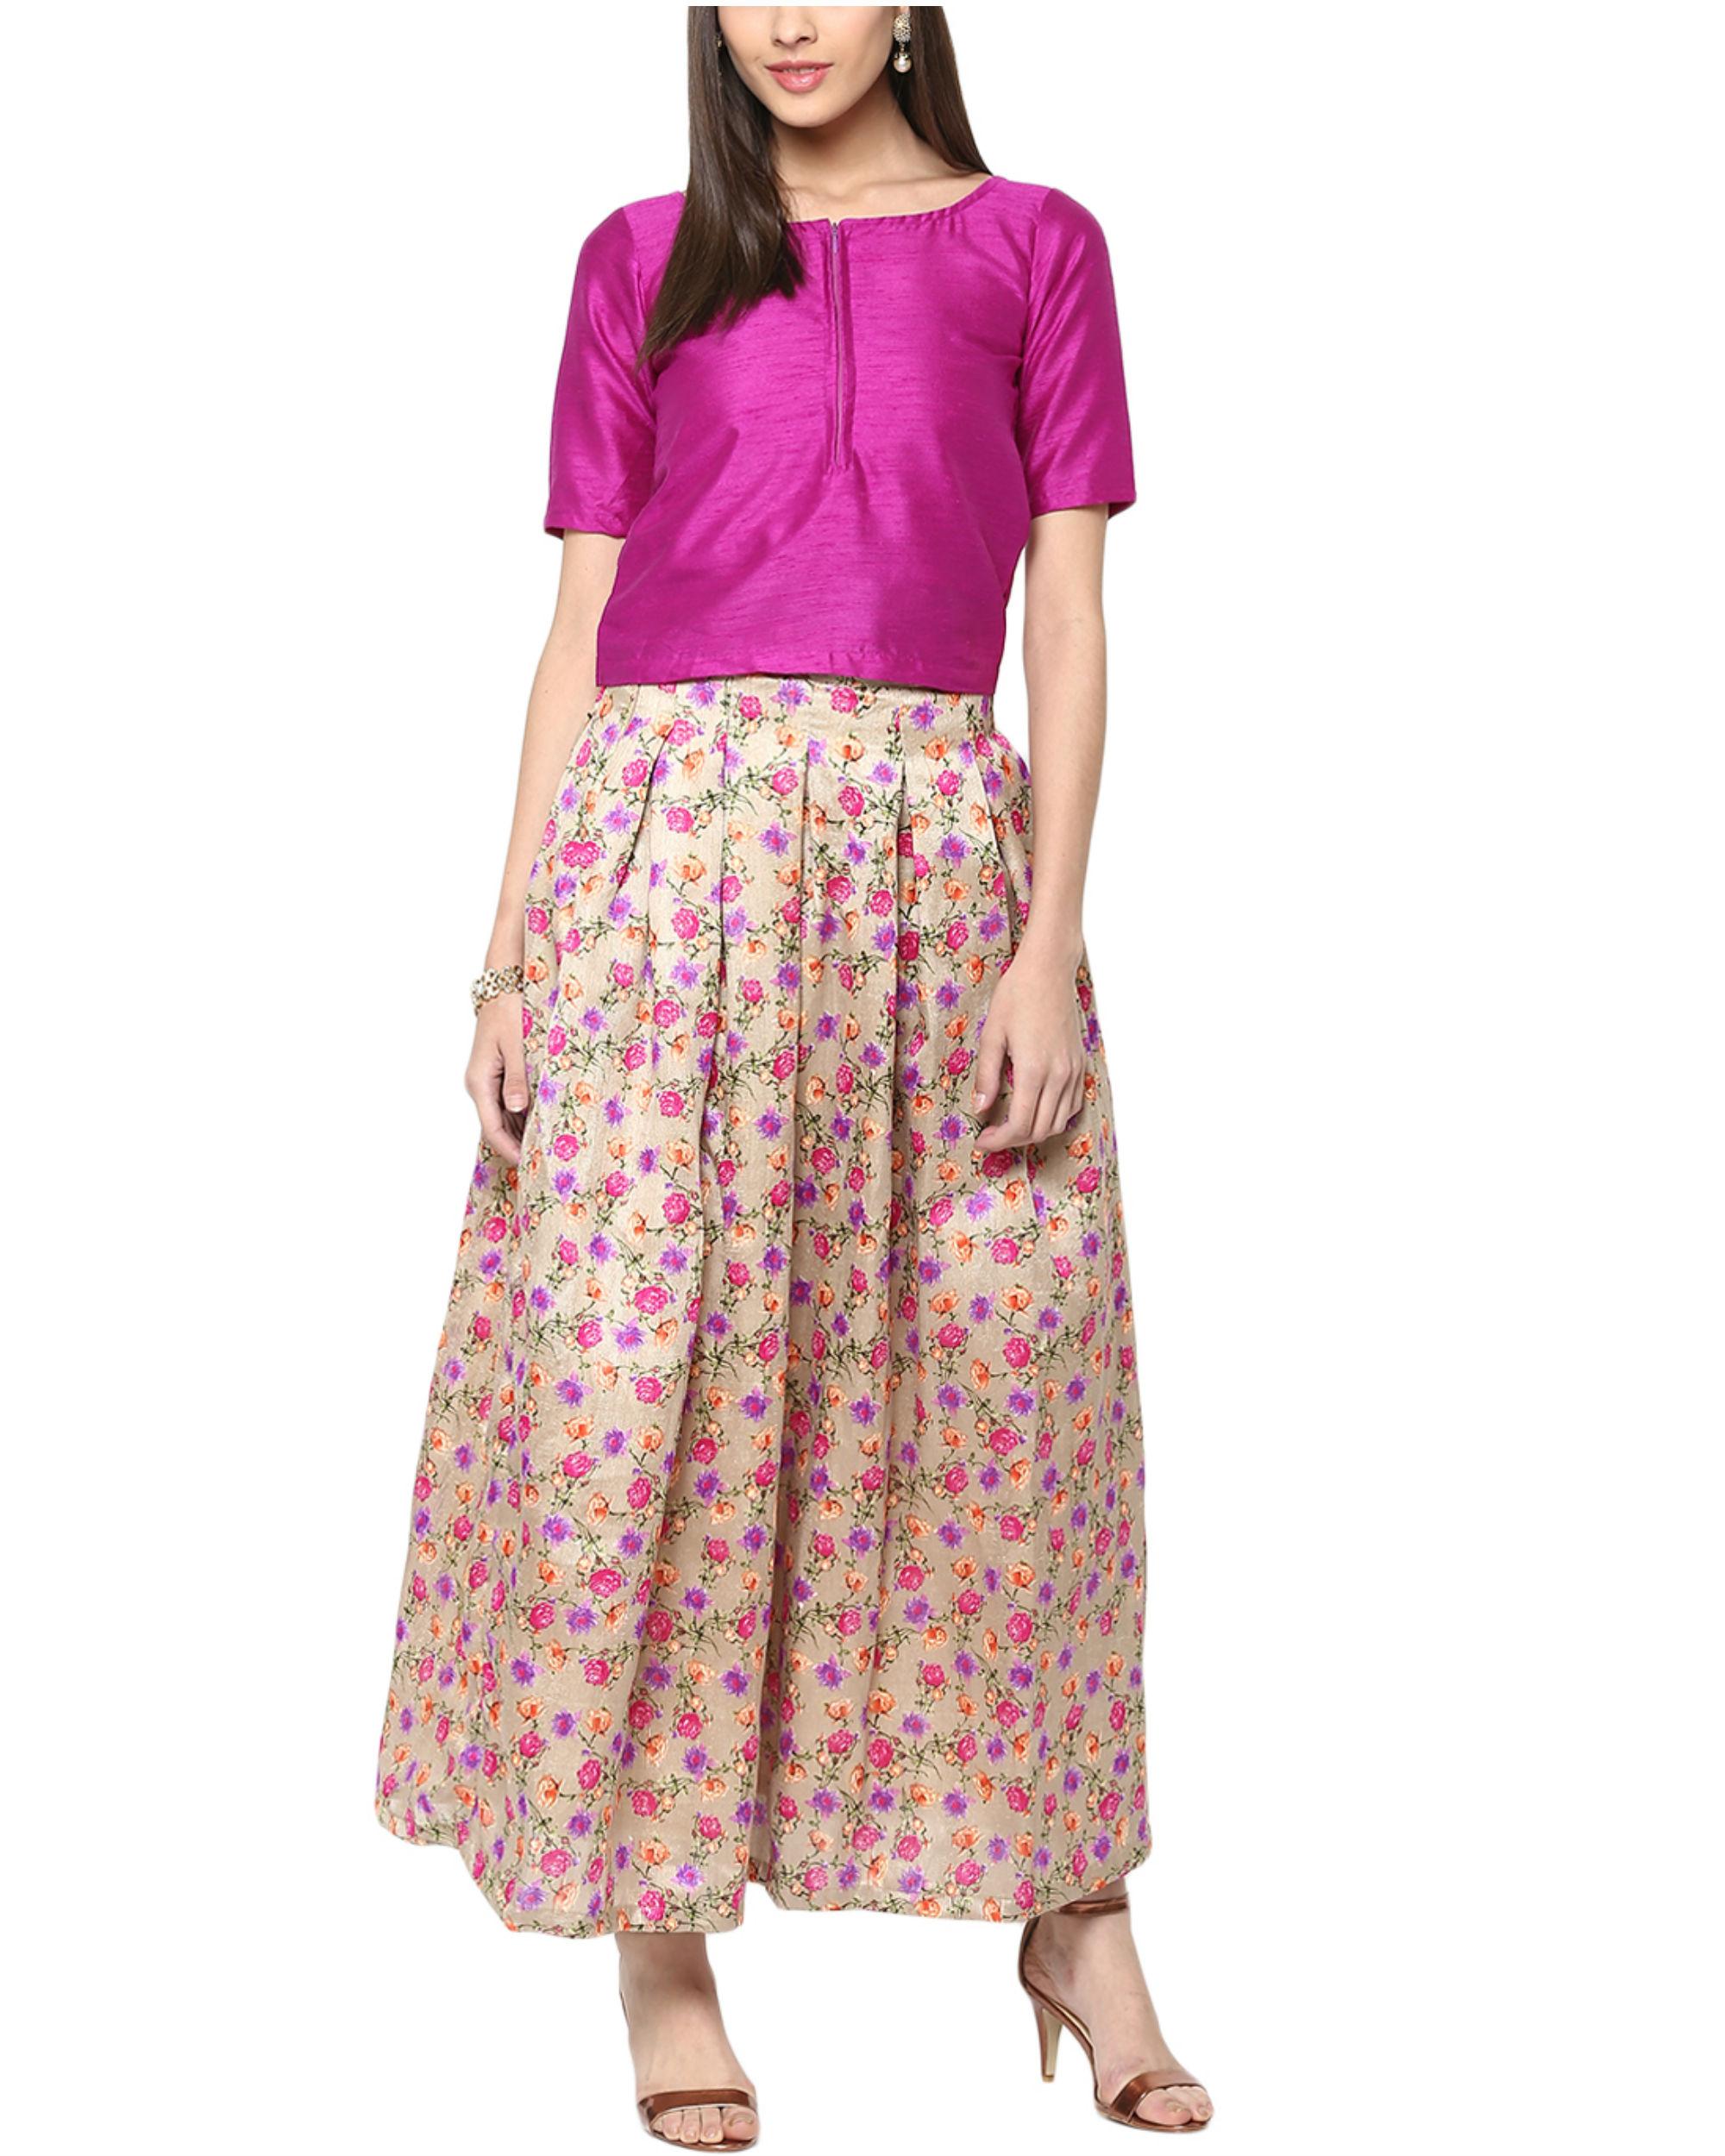 e8dc85a90d Lavender top and skirt set by Sugandh | The Secret Label